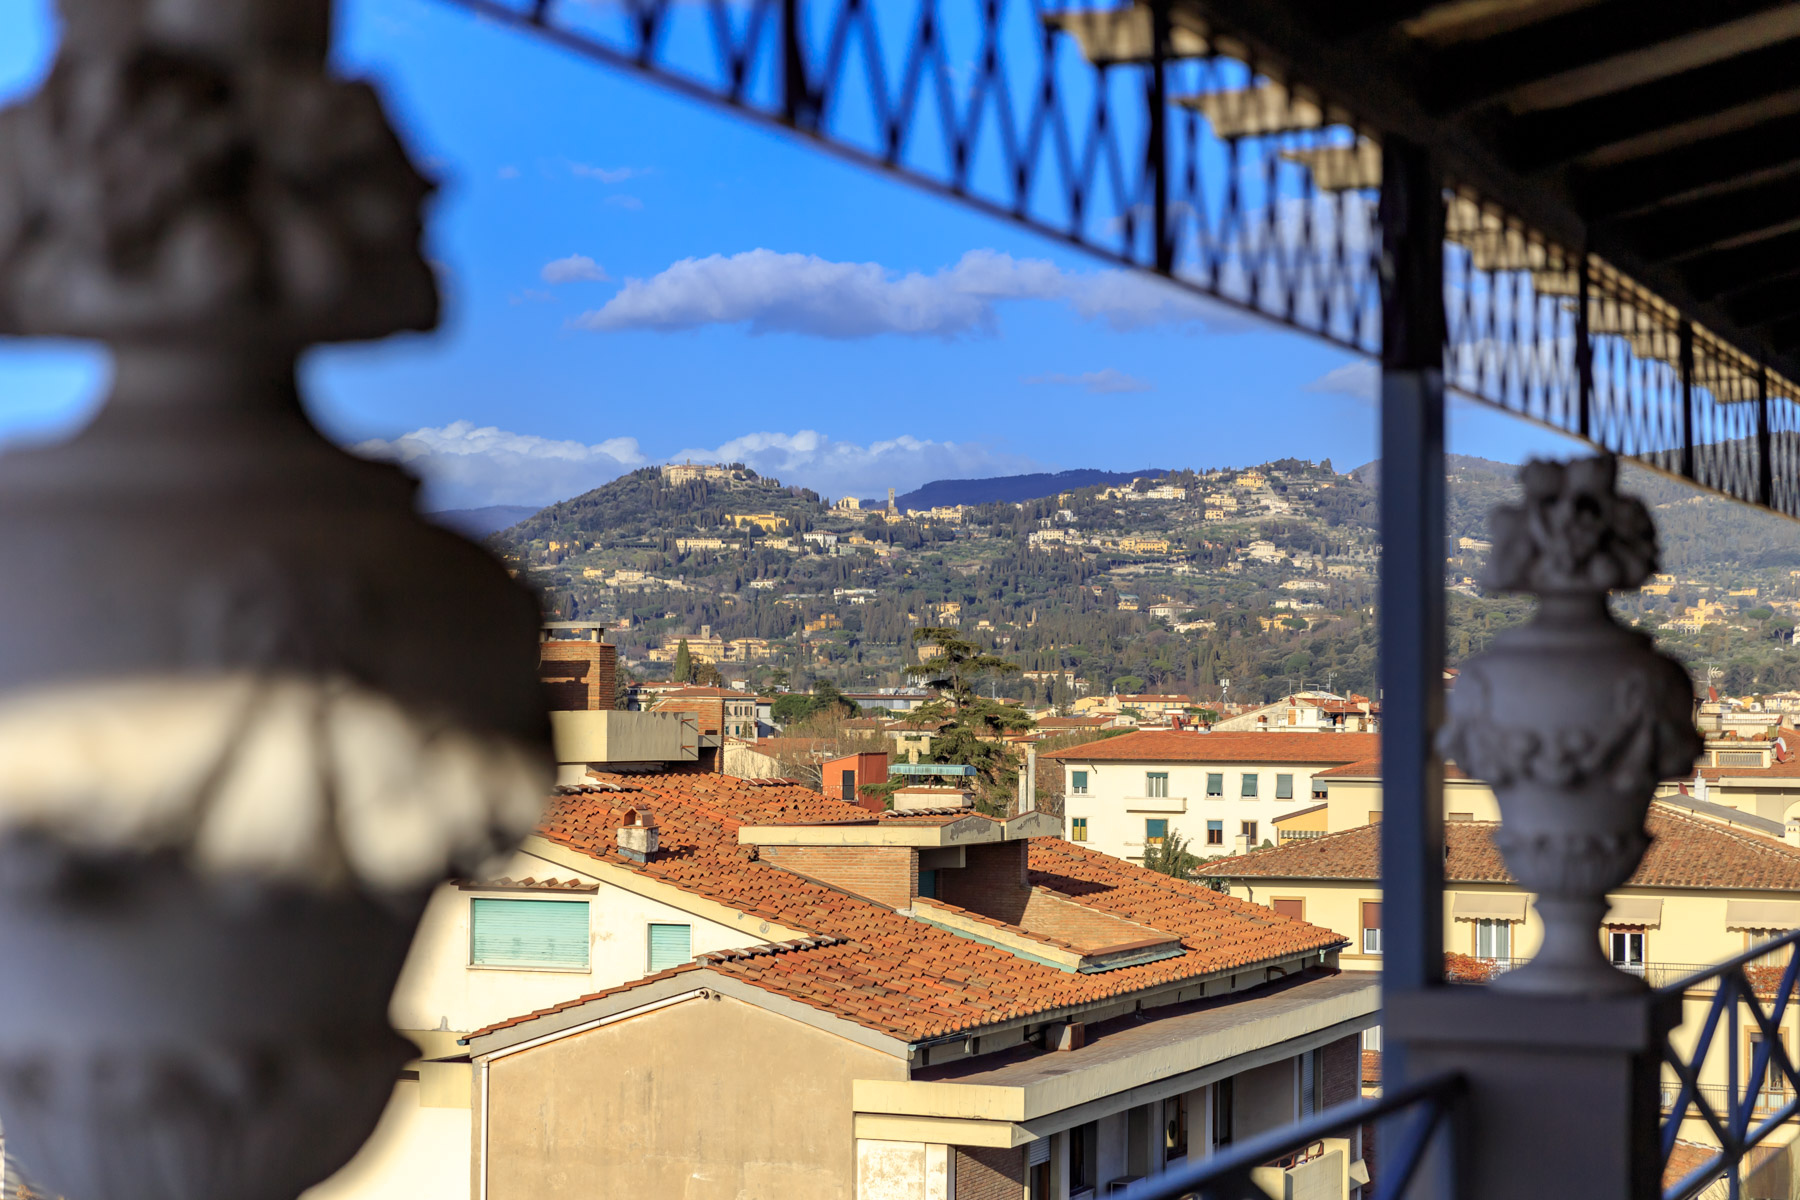 Attico in Vendita a Firenze: 5 locali, 250 mq - Foto 7